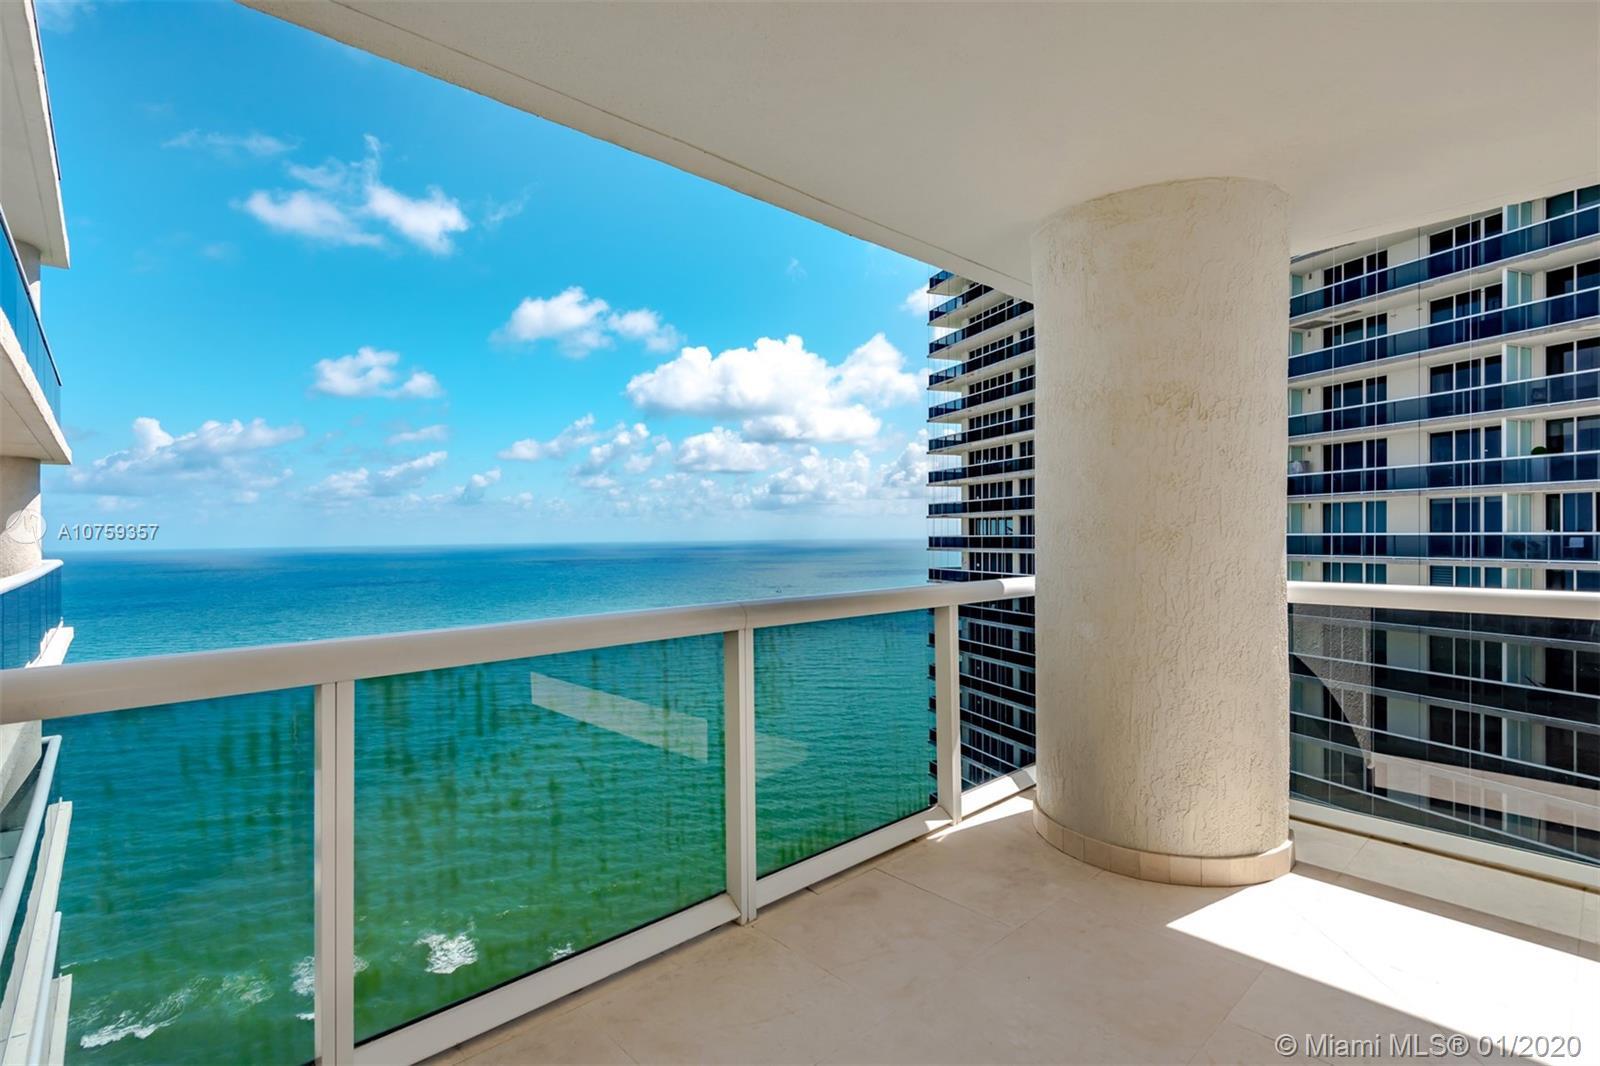 Beach Club Towers #4305 - 02 - photo